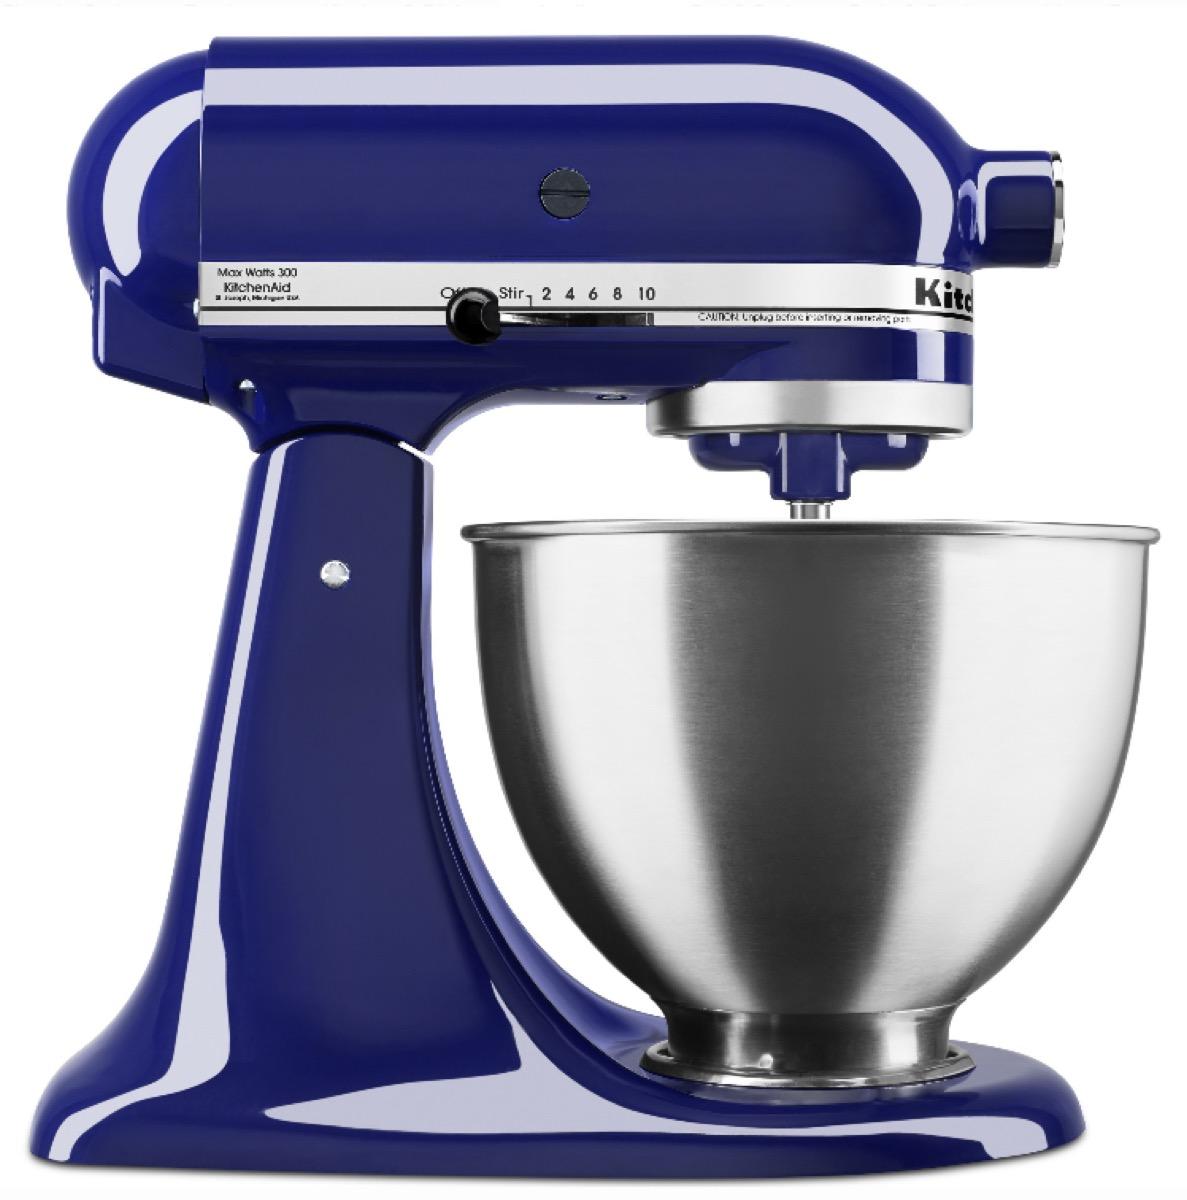 KitchenAid Mixer Cobalt Blue buy after holidays